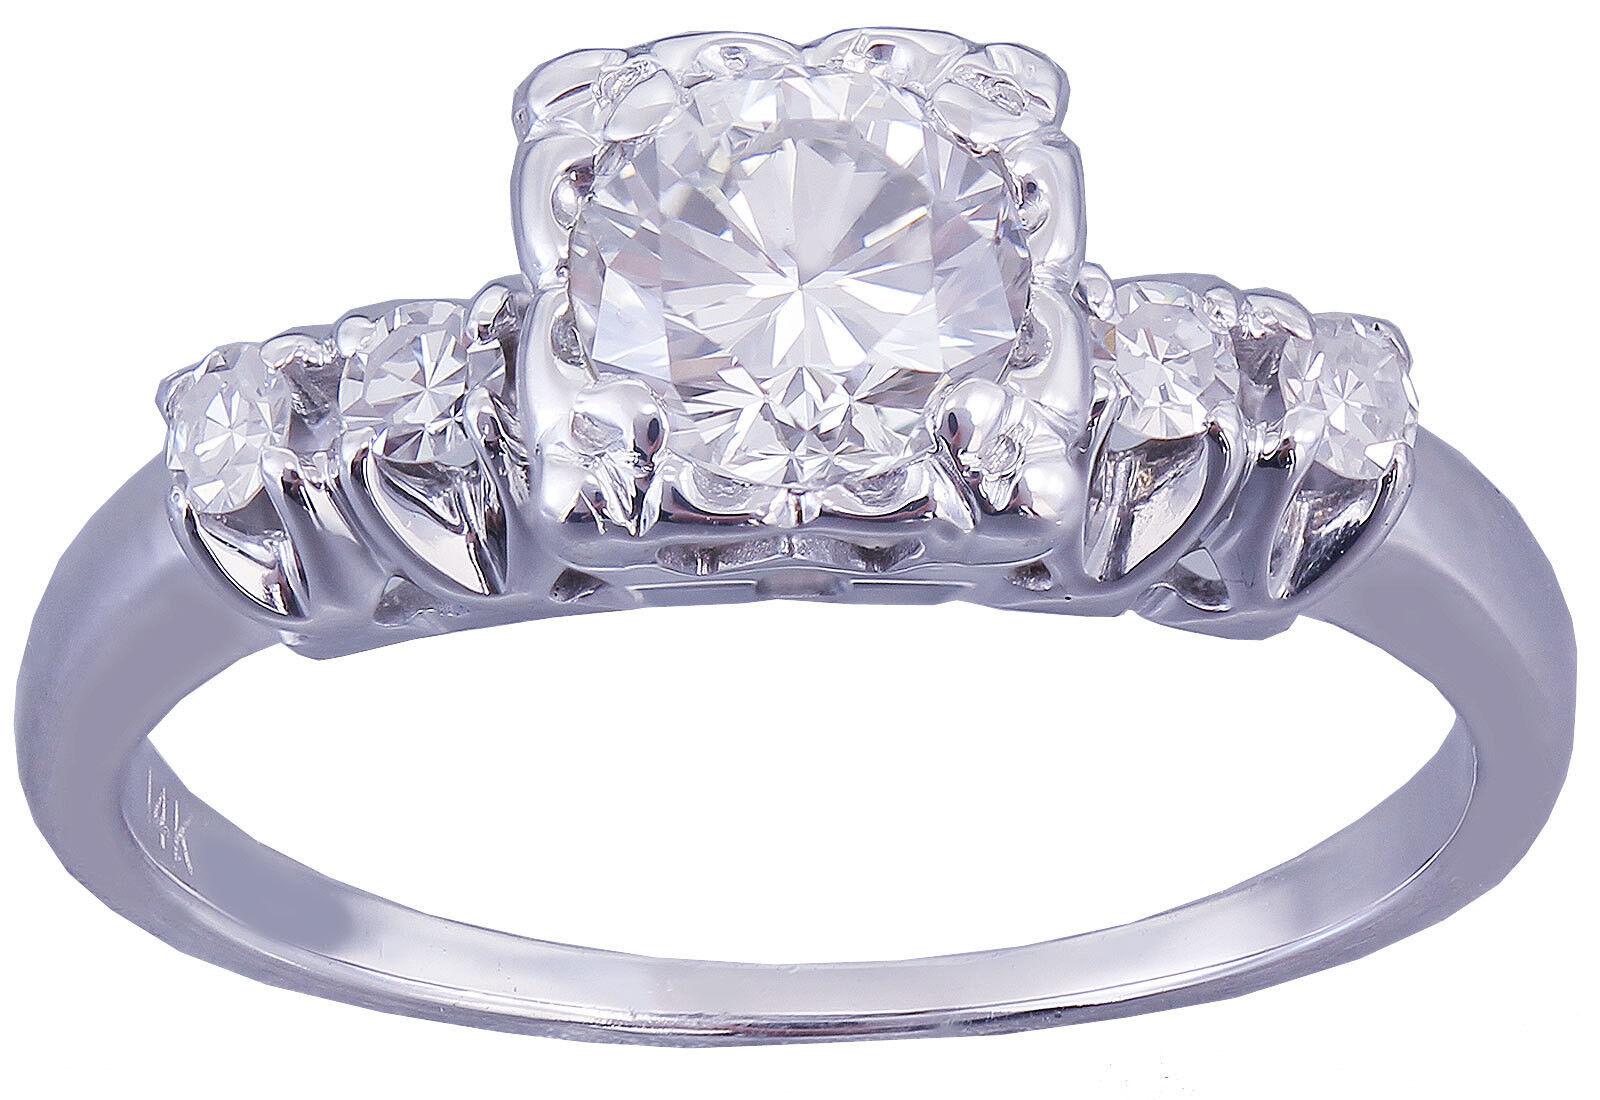 14k White gold Round Cut Diamond Engagement Ring Art Deco Antique Style 0.72ct